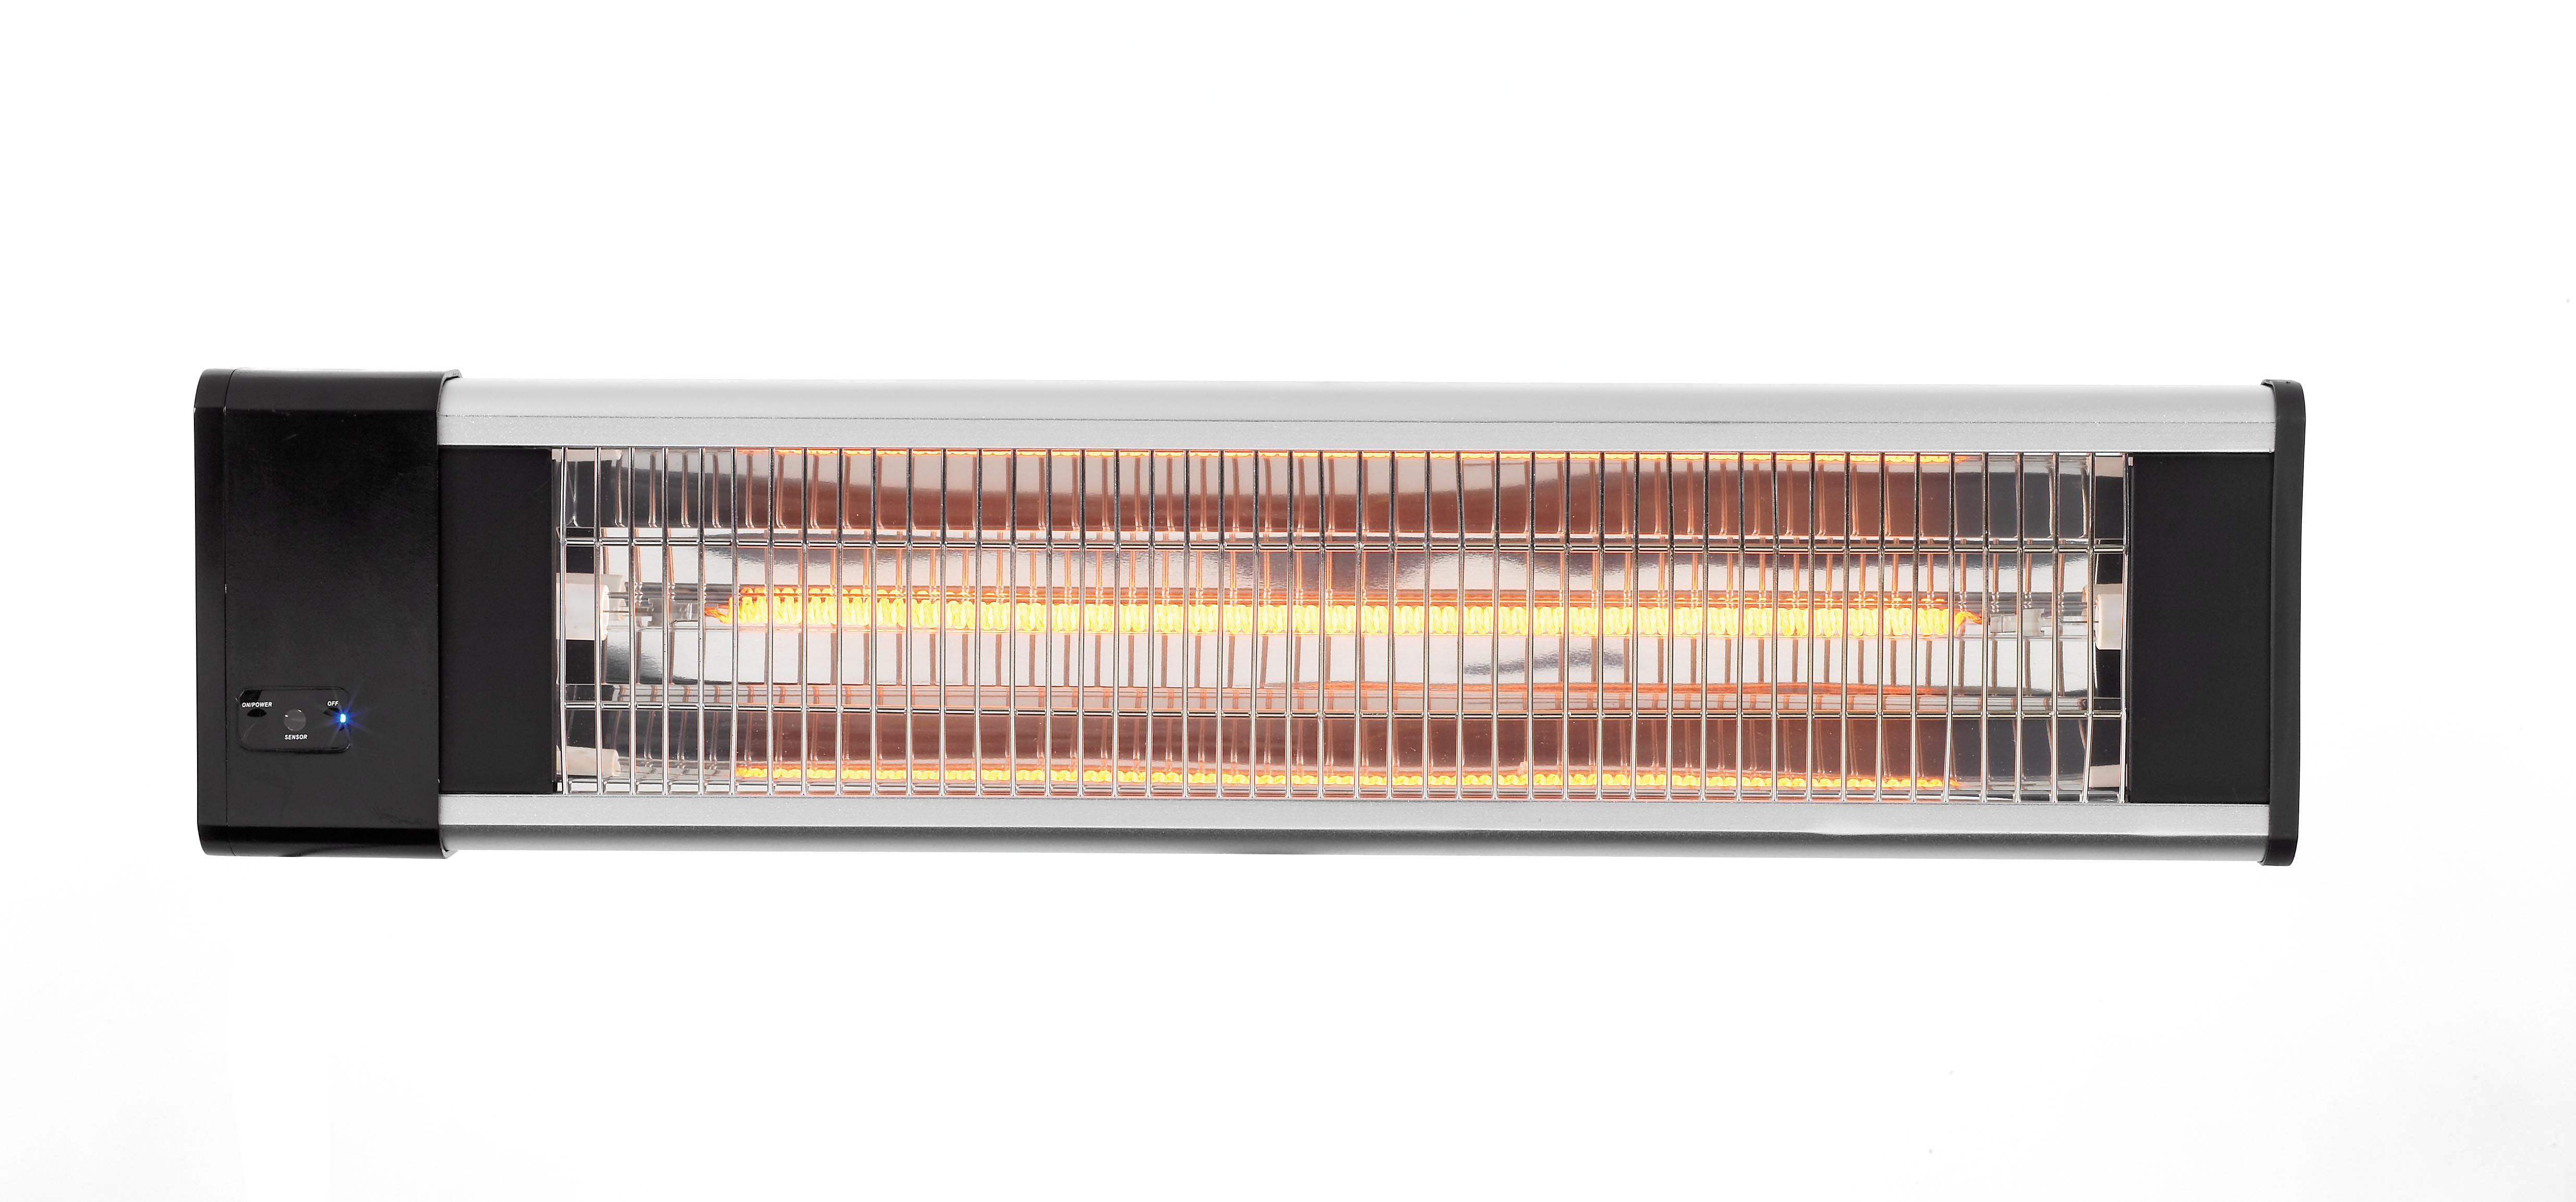 Outdoor Heater Elec Jumbuck 1800w Carbon Fibre Ele Jeh420 Bunnings Warehouse Outdoor Electric Heater Electric Heater Heater